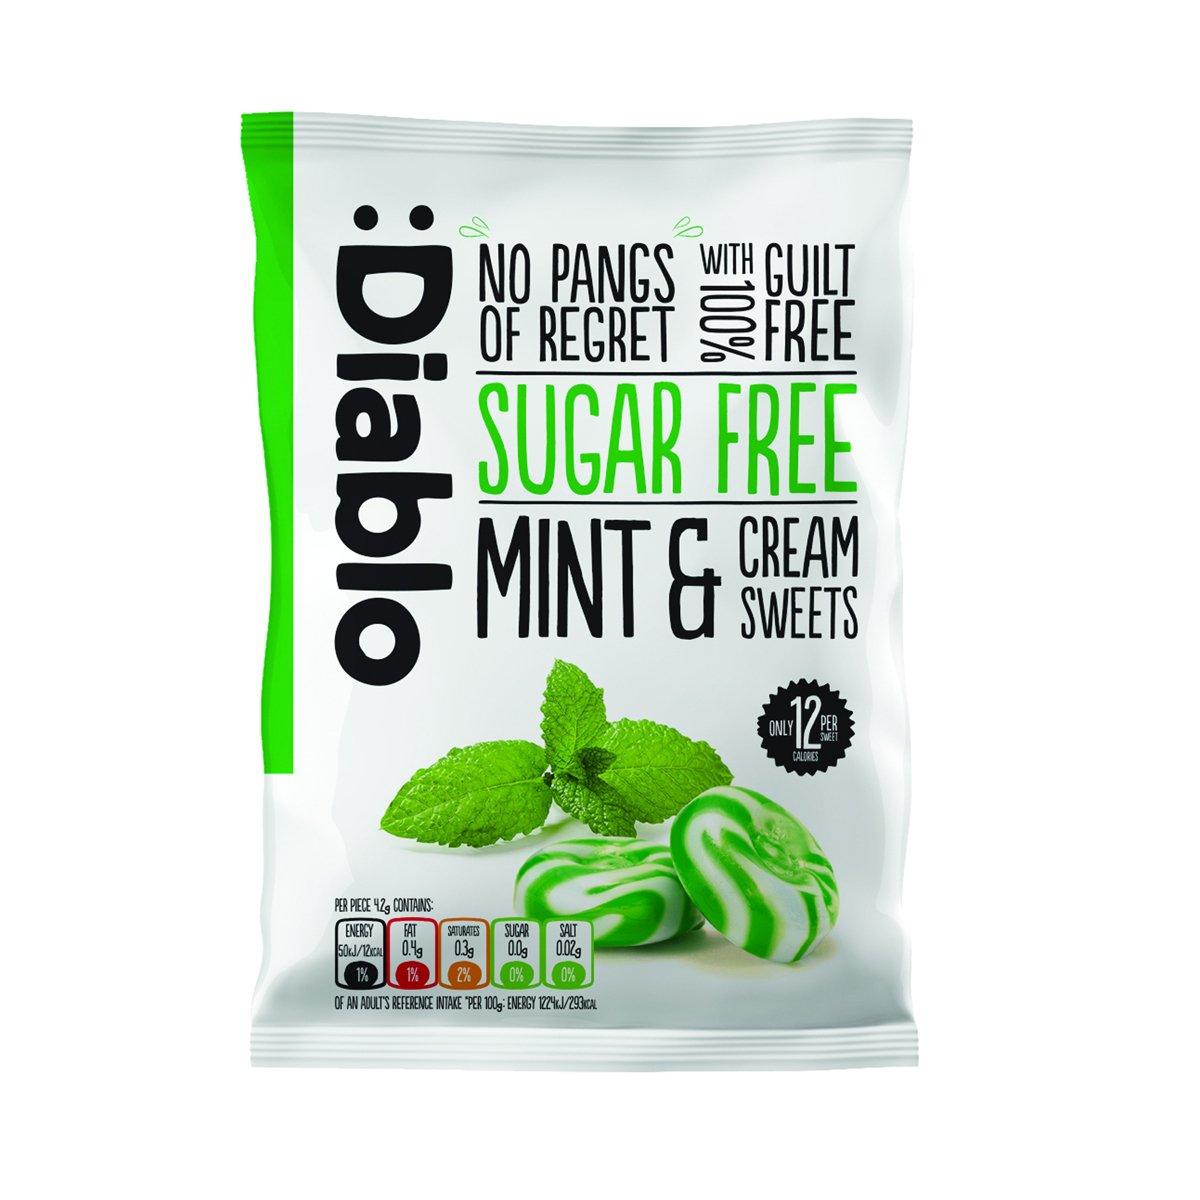 :Diablo - Mint & Cream Sweets